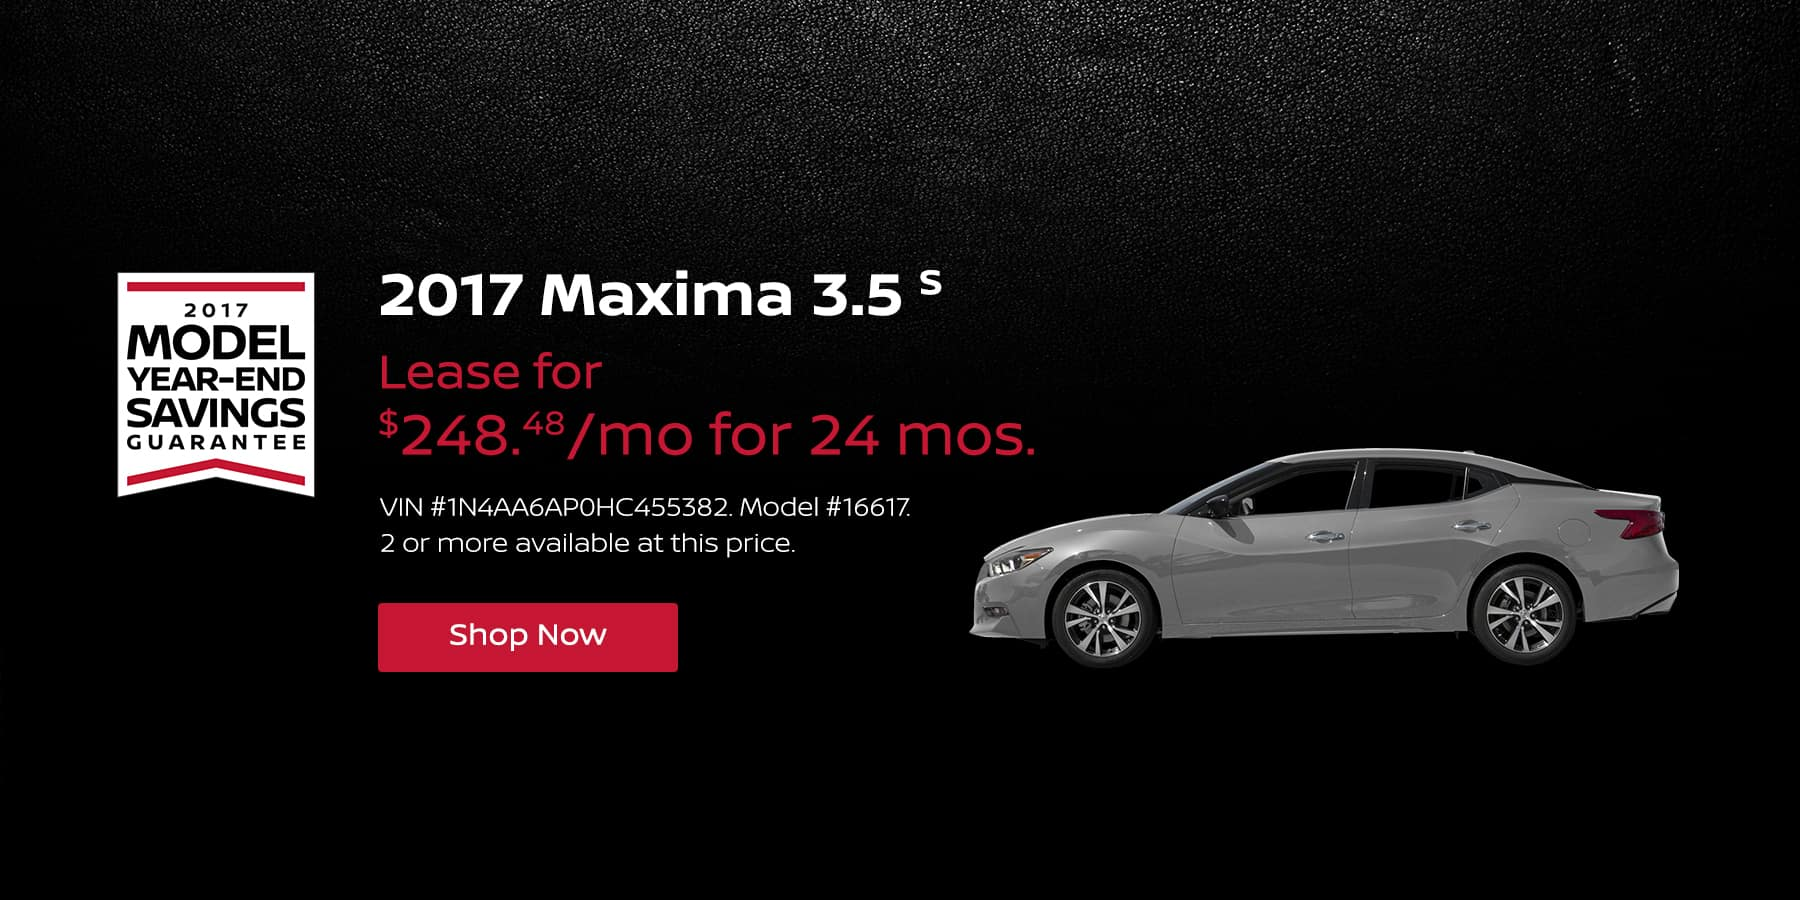 Maxima 3.5 S January Offer Jeffrey Nissan